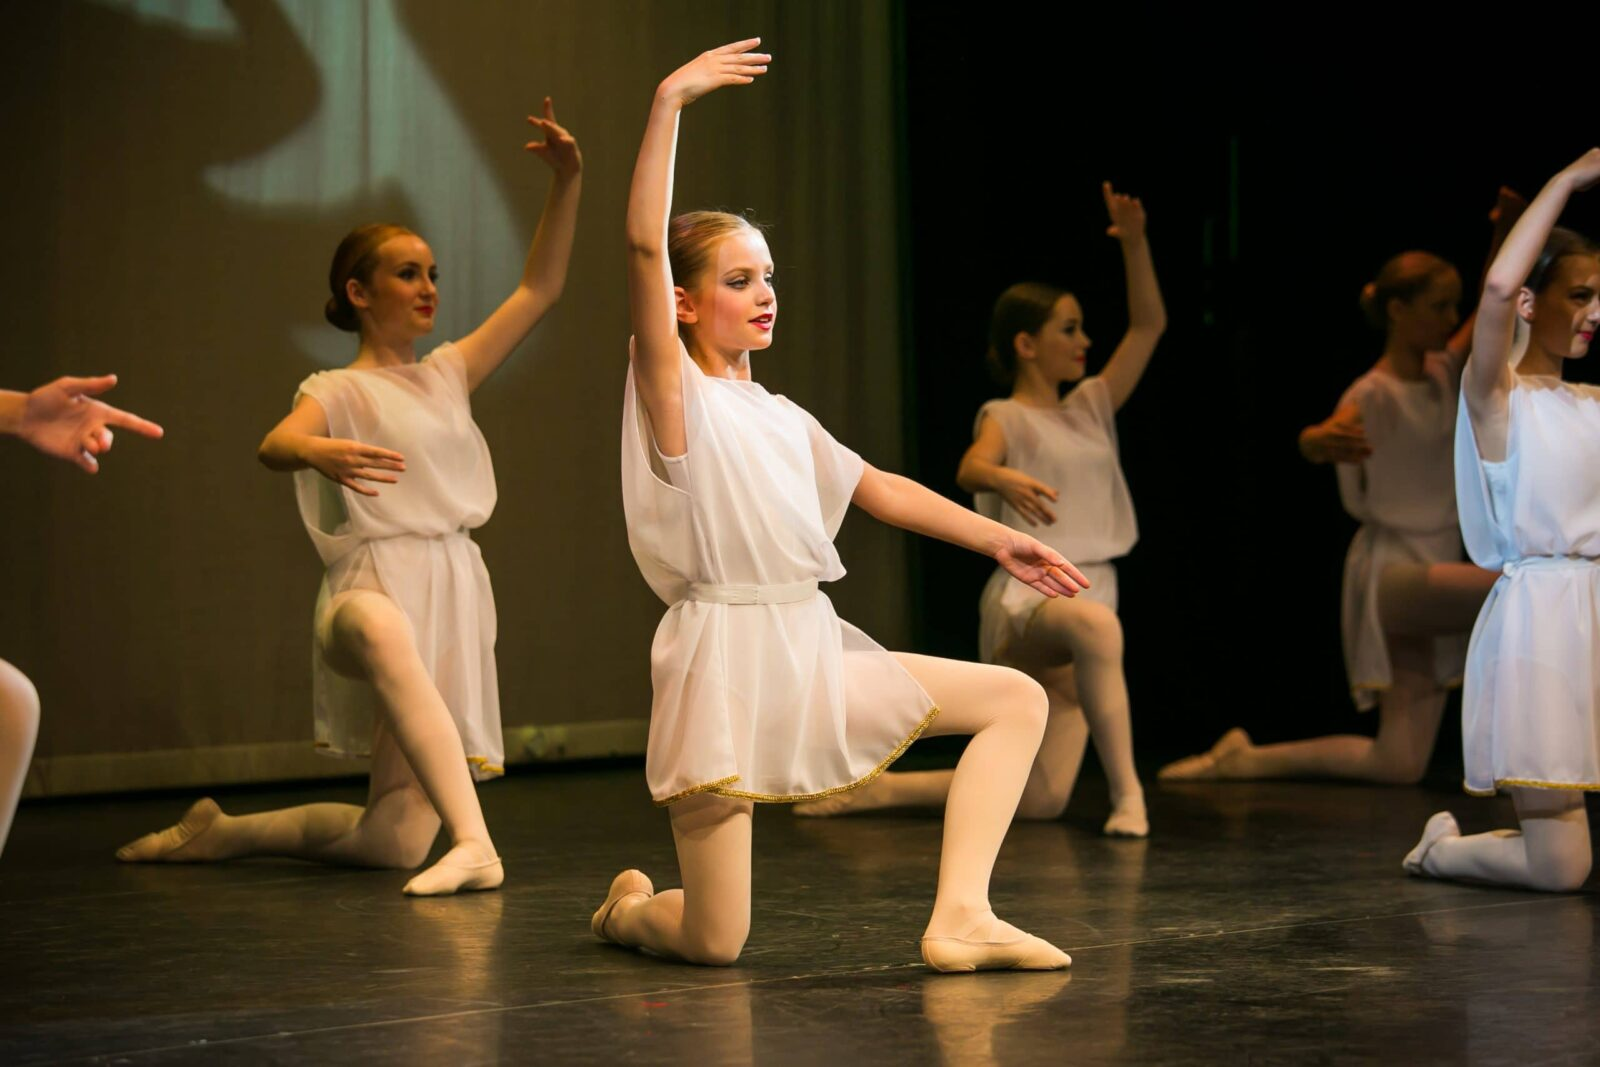 Modern Dance Classes for Kids in Woking